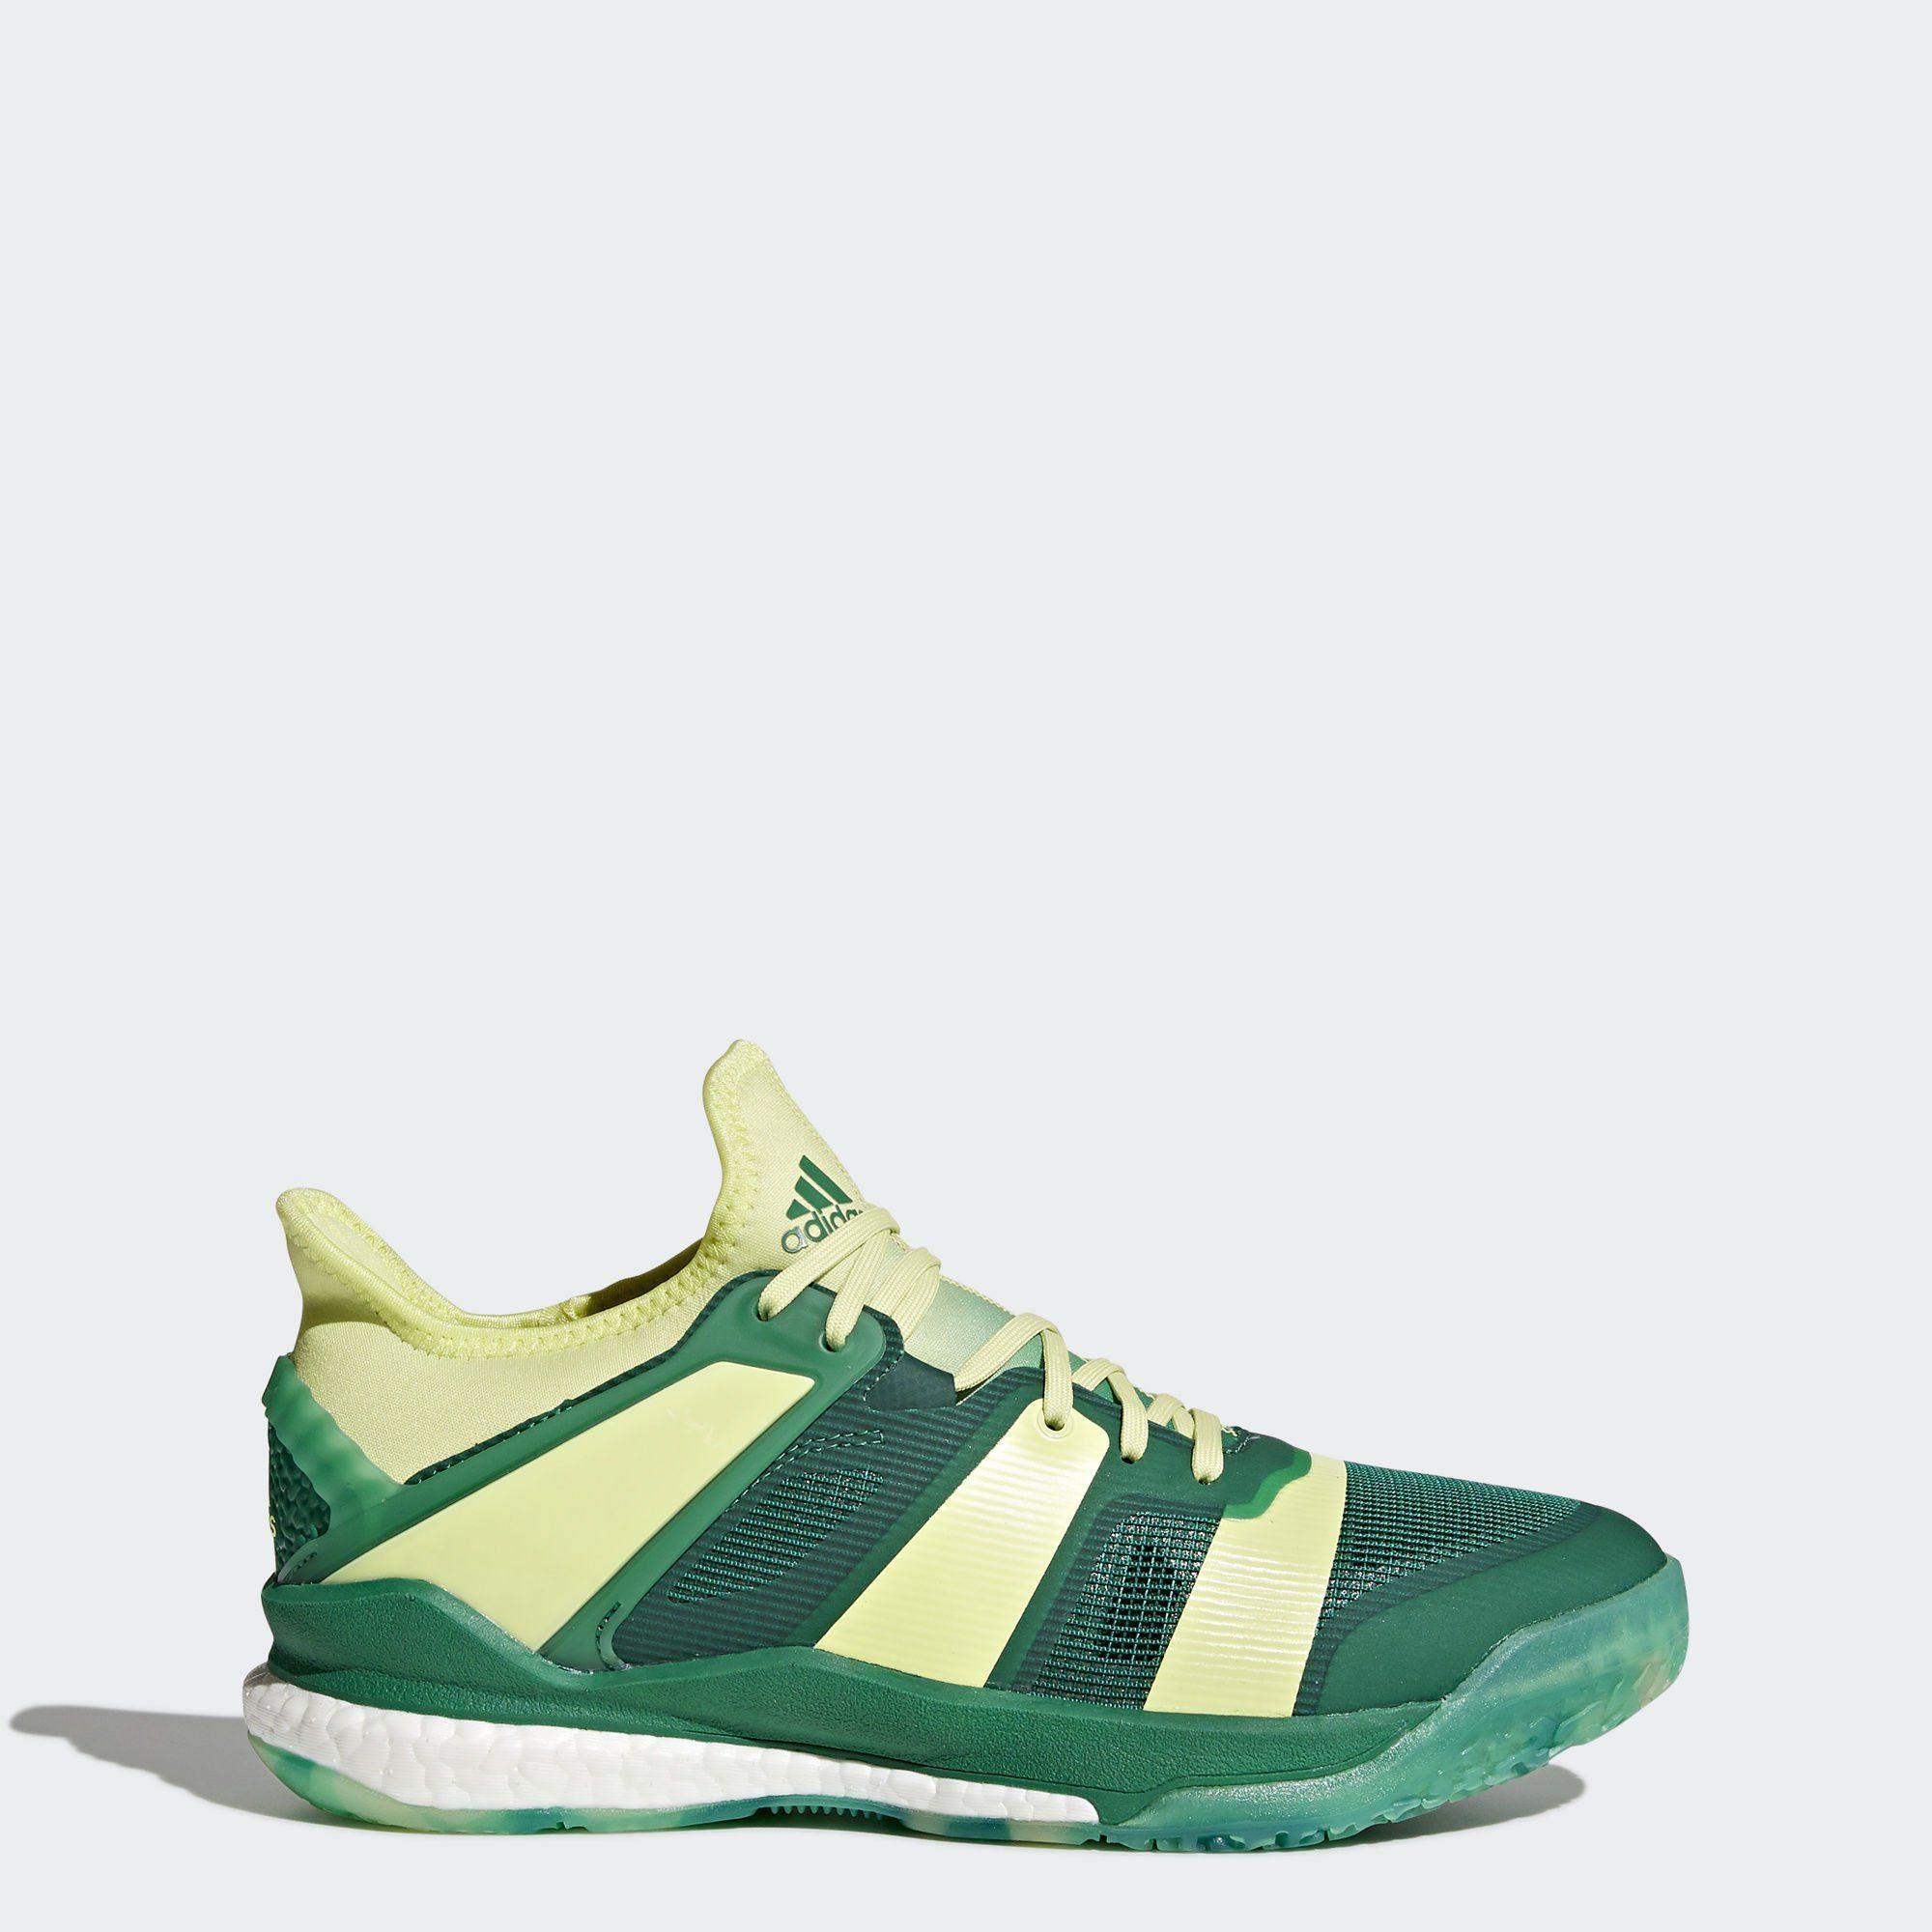 adidas Performance Stabil X Handballschuh kaufen  green